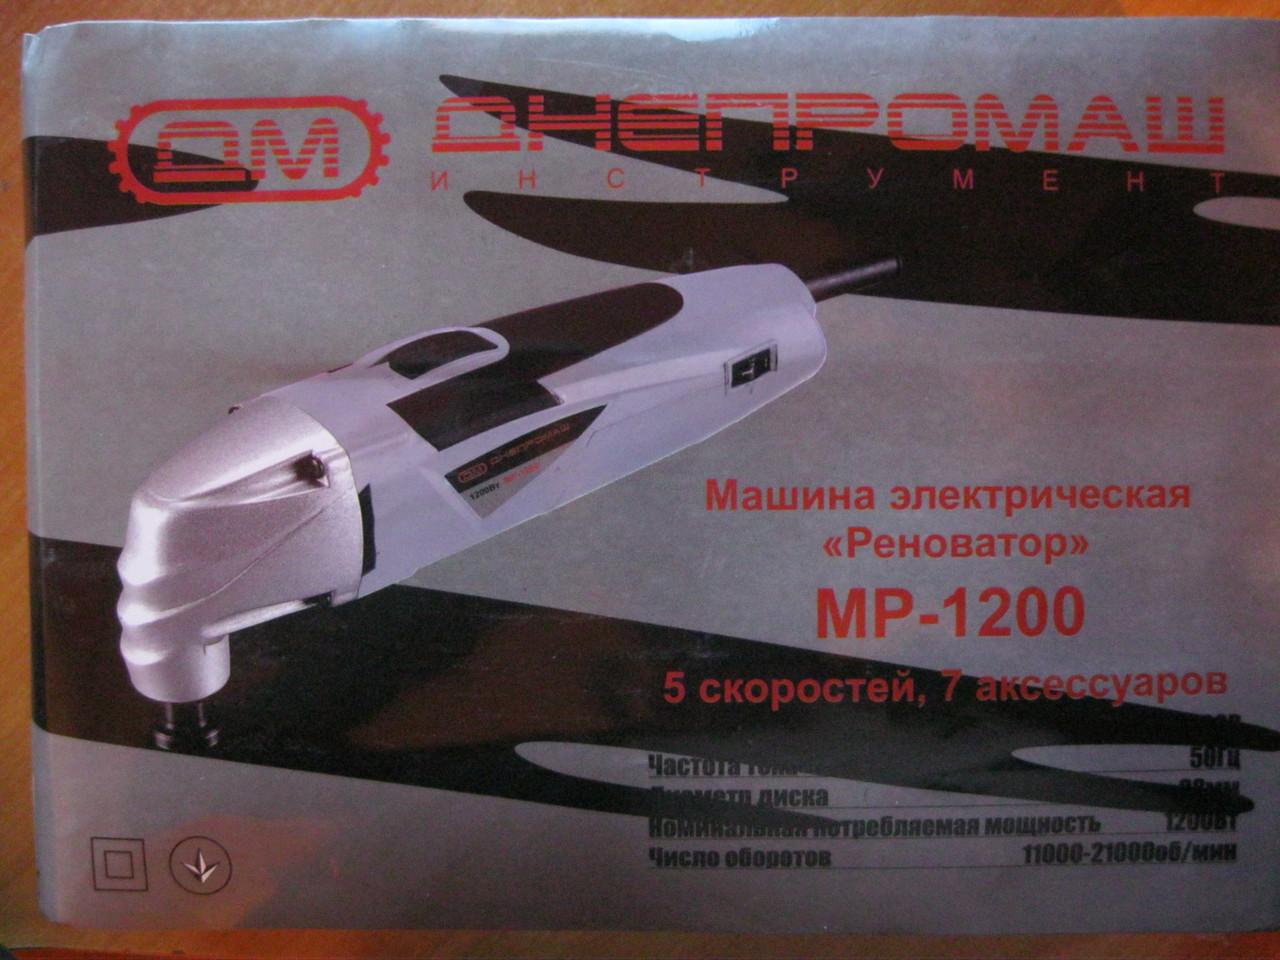 Реноватор Днепромаш МР-1200